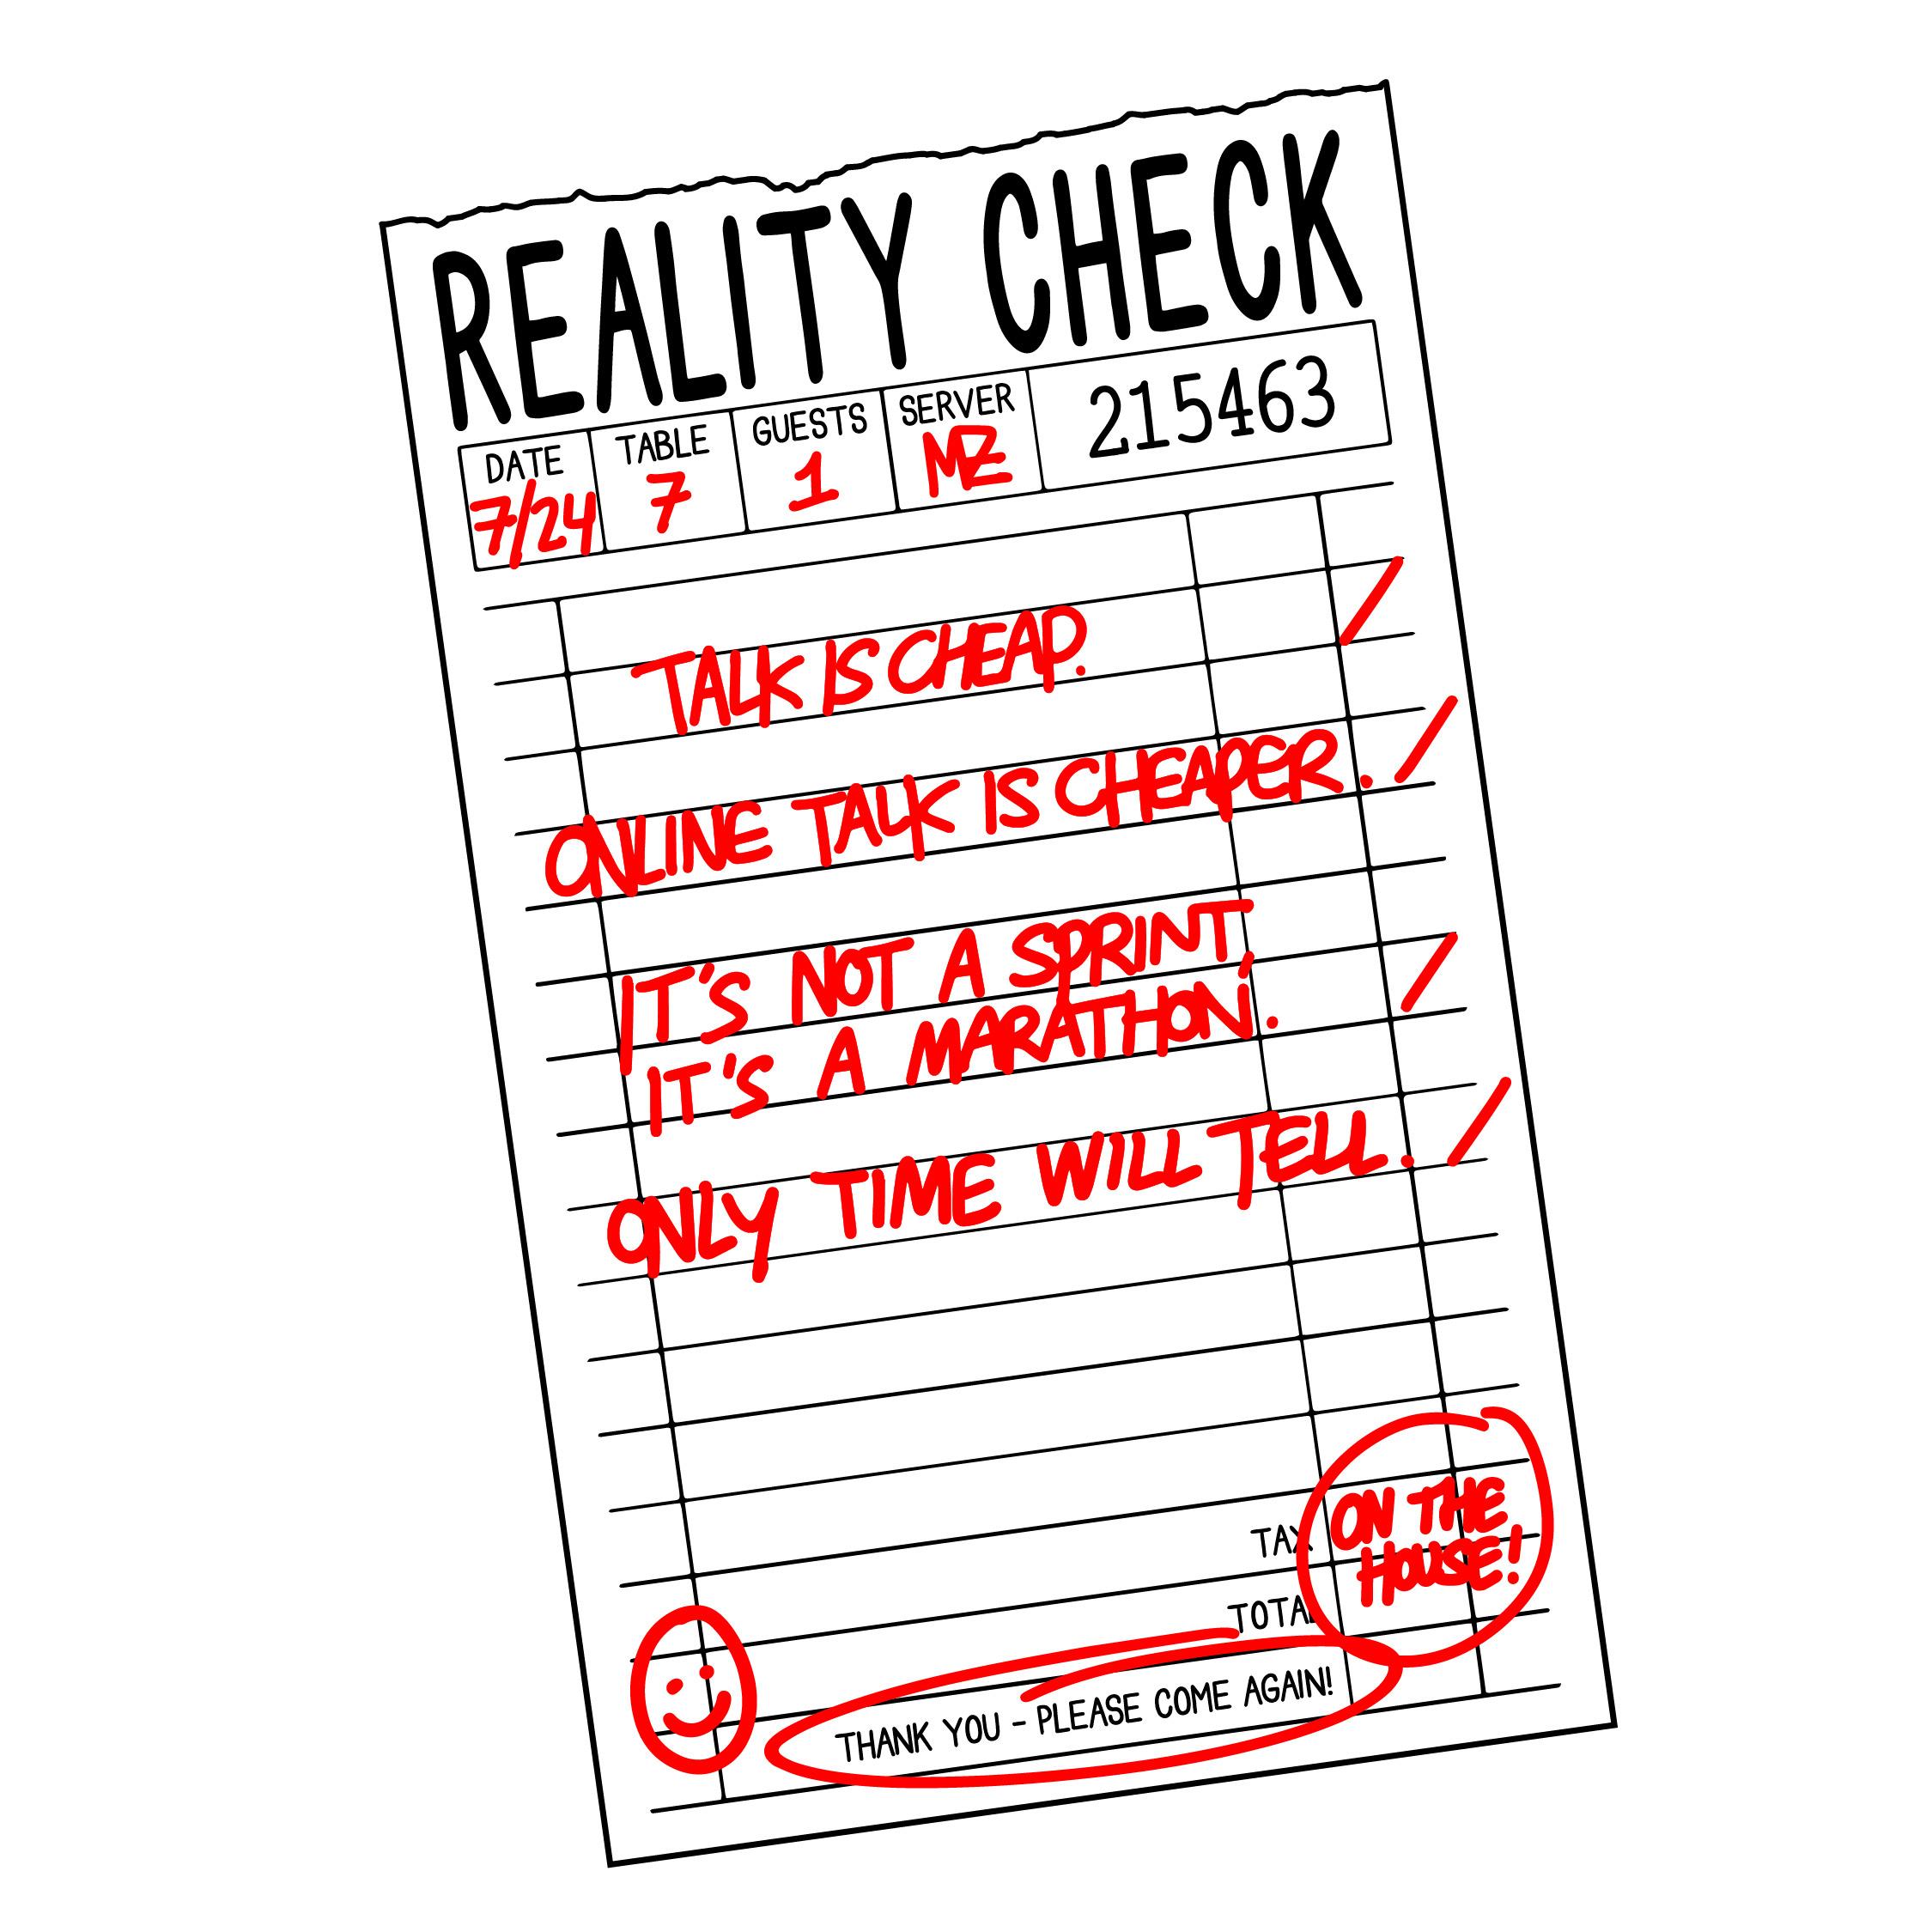 reality check-01.jpg